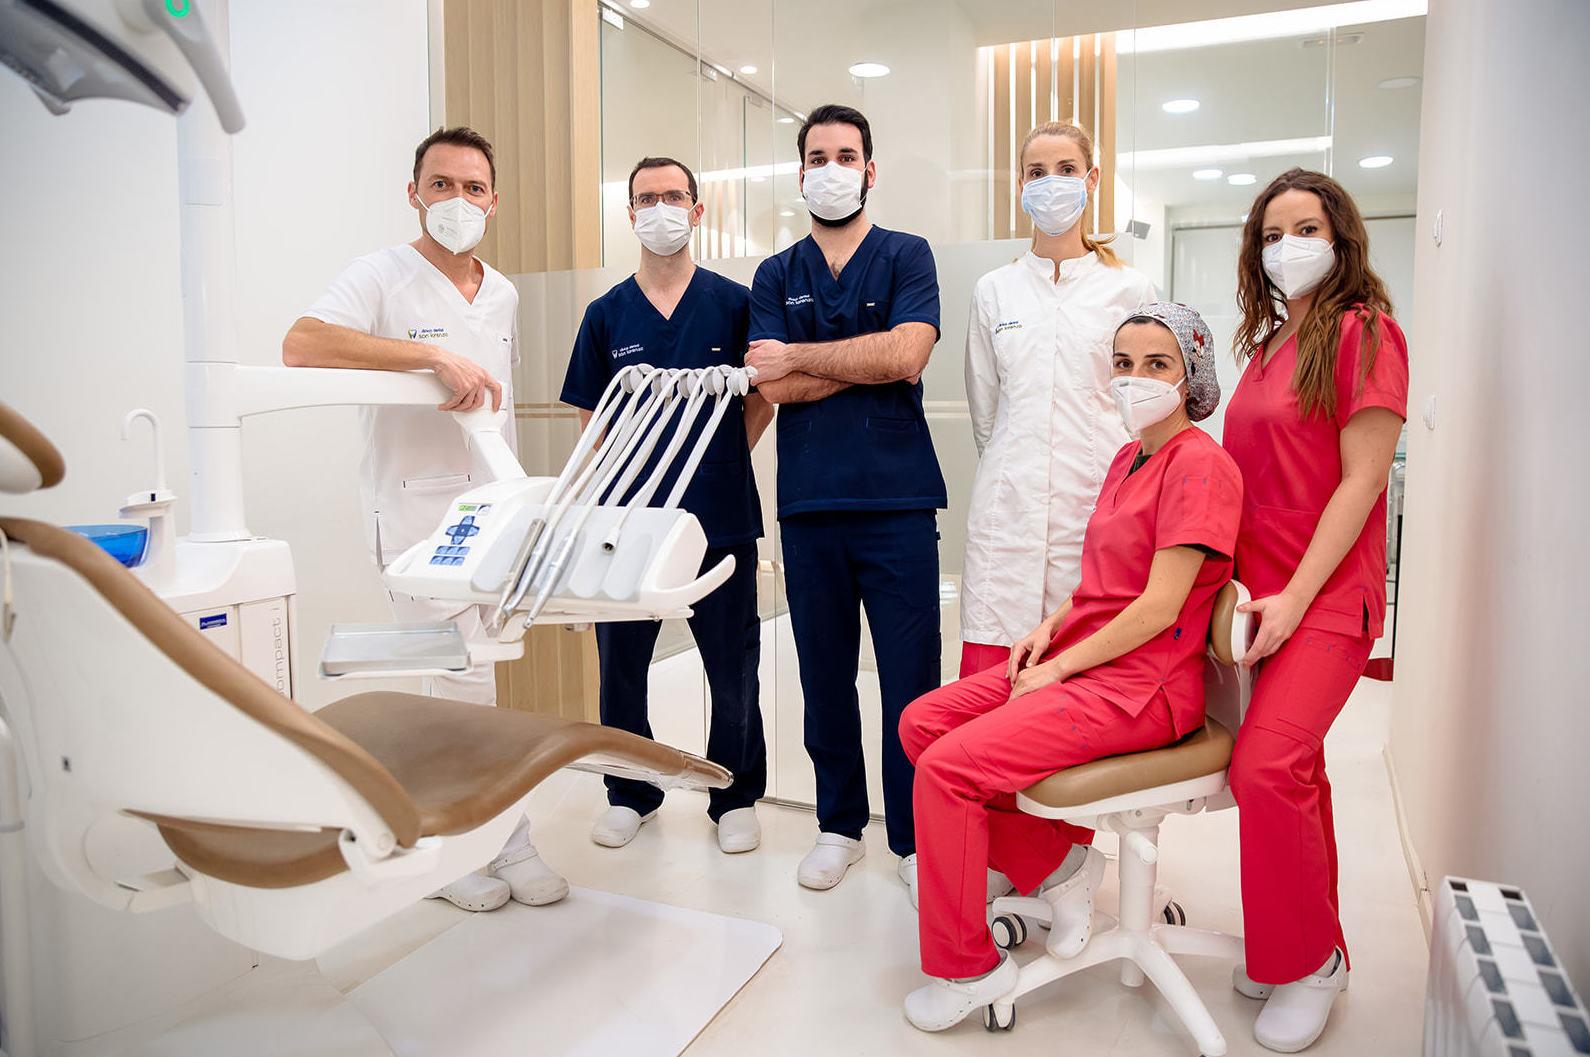 Foto 1 de Clínicas dentales en Zaragoza | Clínica Dental San Lorenzo